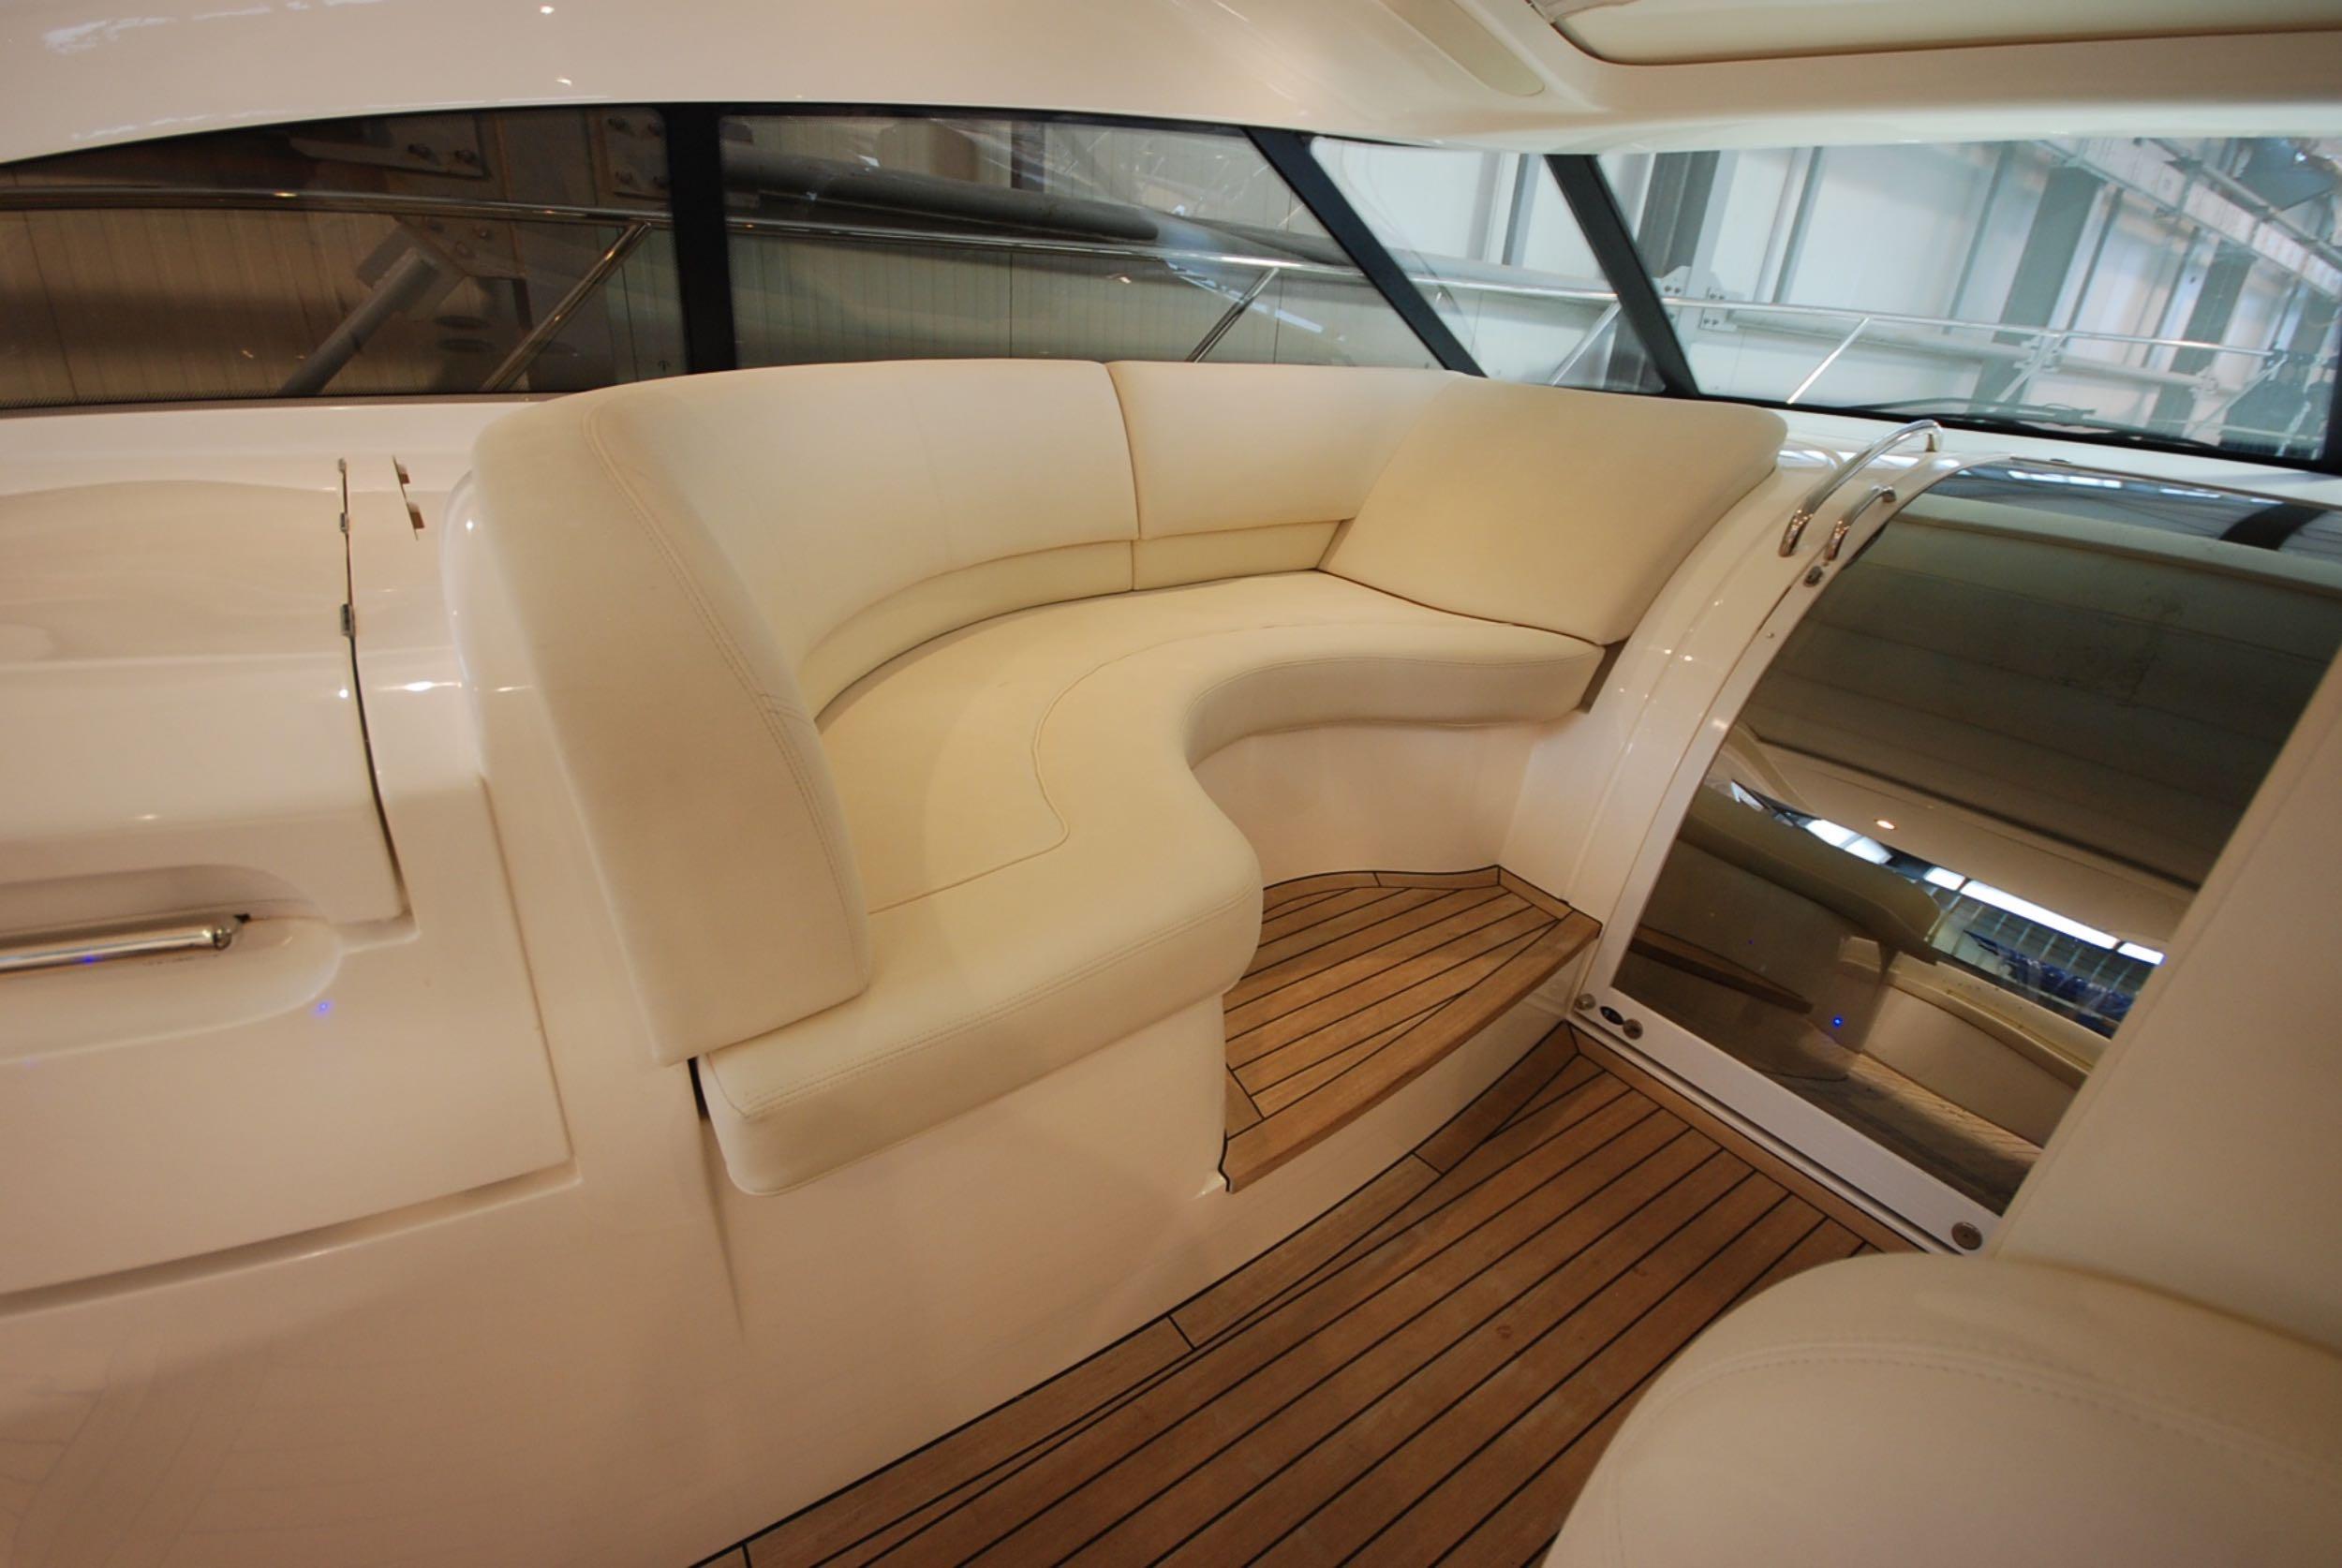 princess-yachts-v58-maestro-di-vita-for-sale-10.jpg